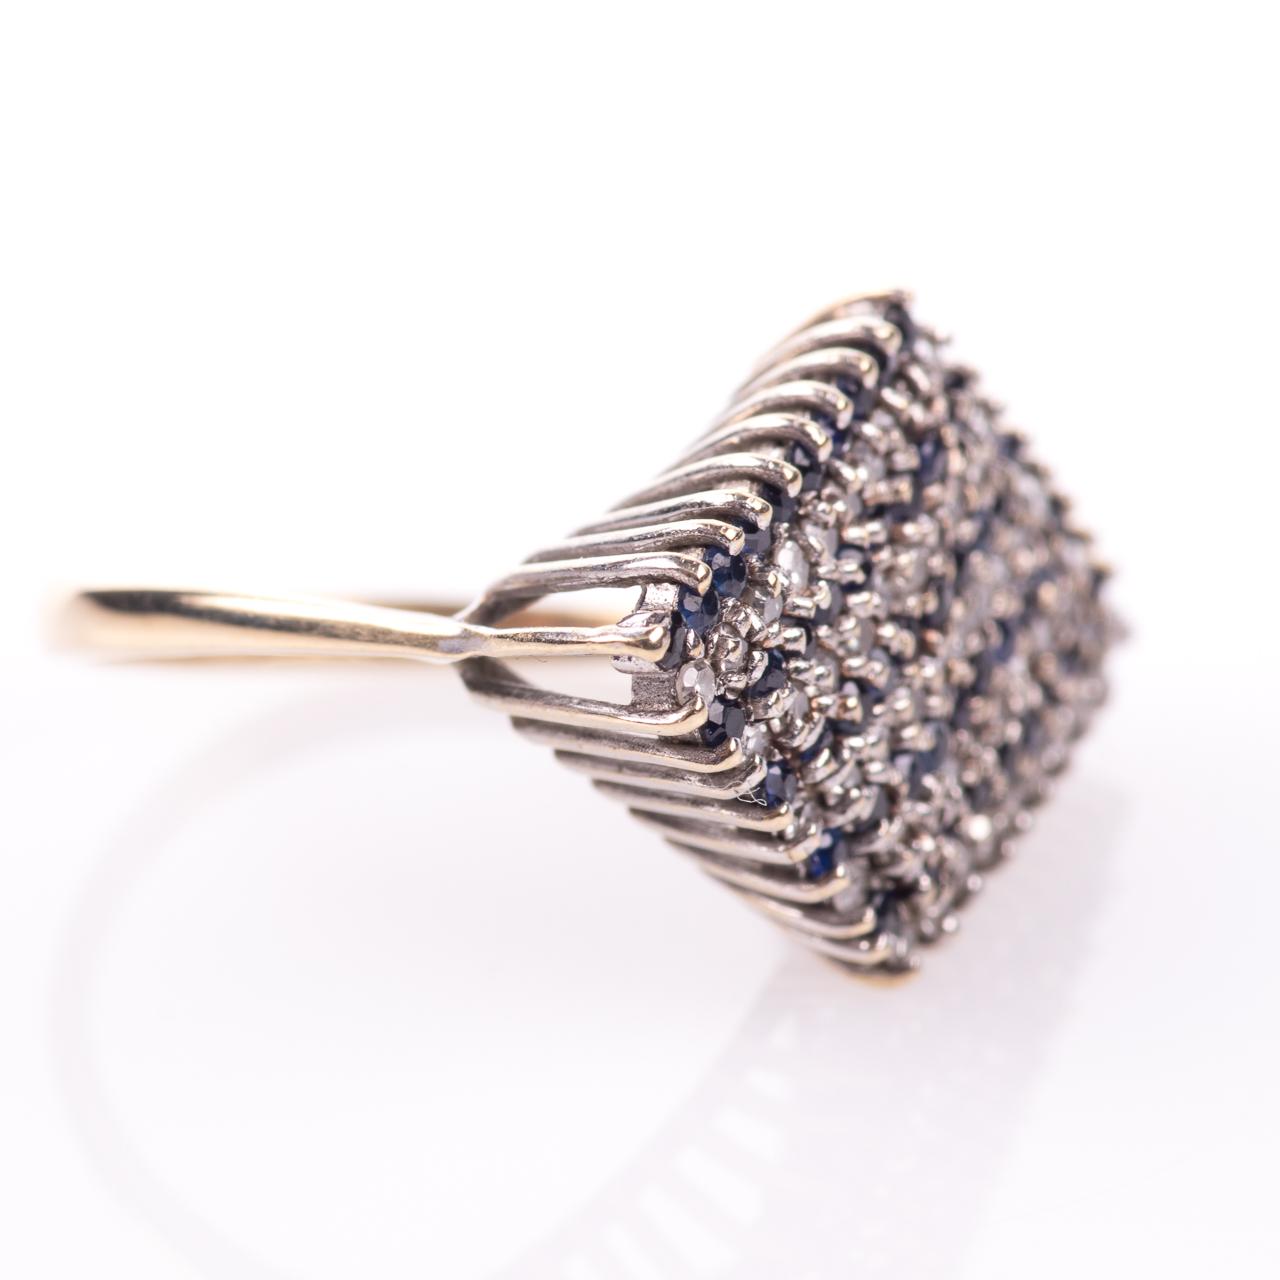 9ct Gold Sapphire & 0.50ct Diamond Ring Sheffield 1979 - Image 6 of 7